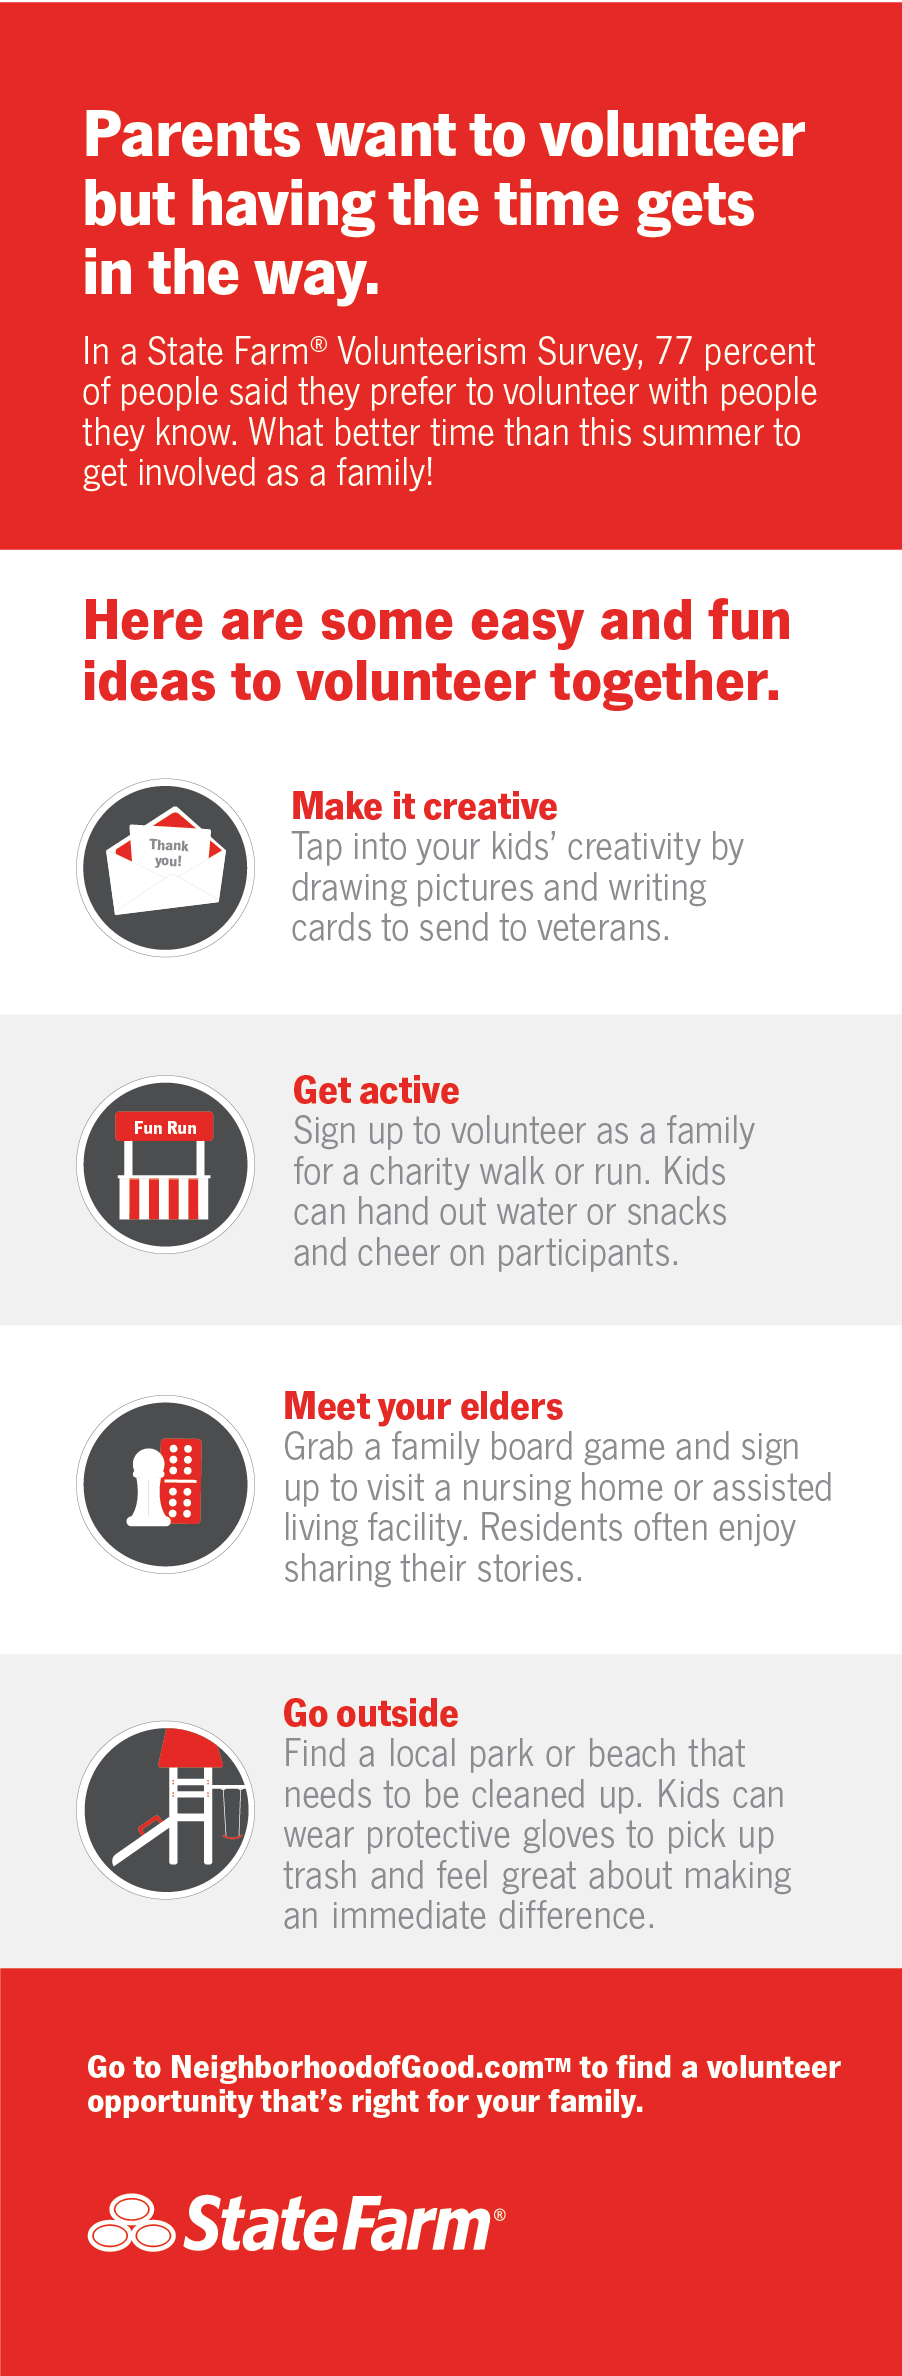 family volunteering survey generates ideas